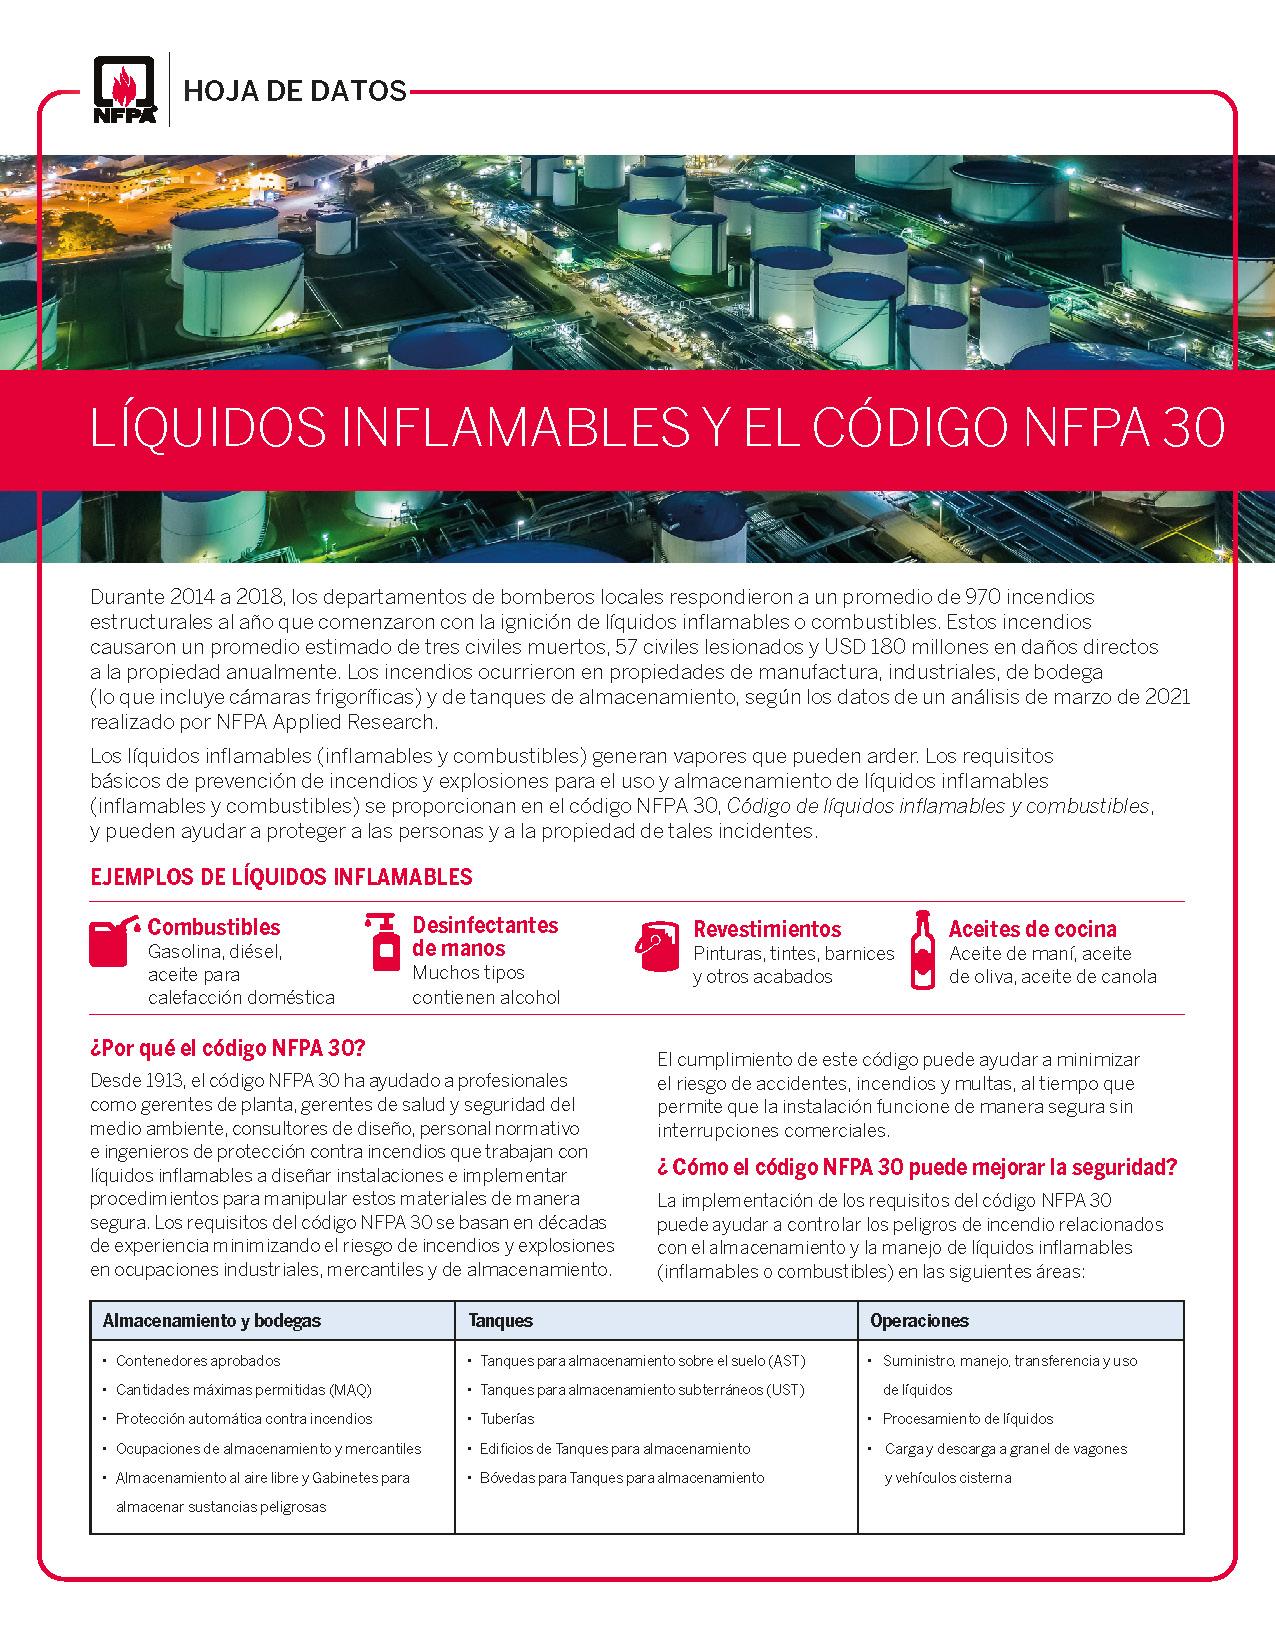 NFPA 30 Fact Sheet